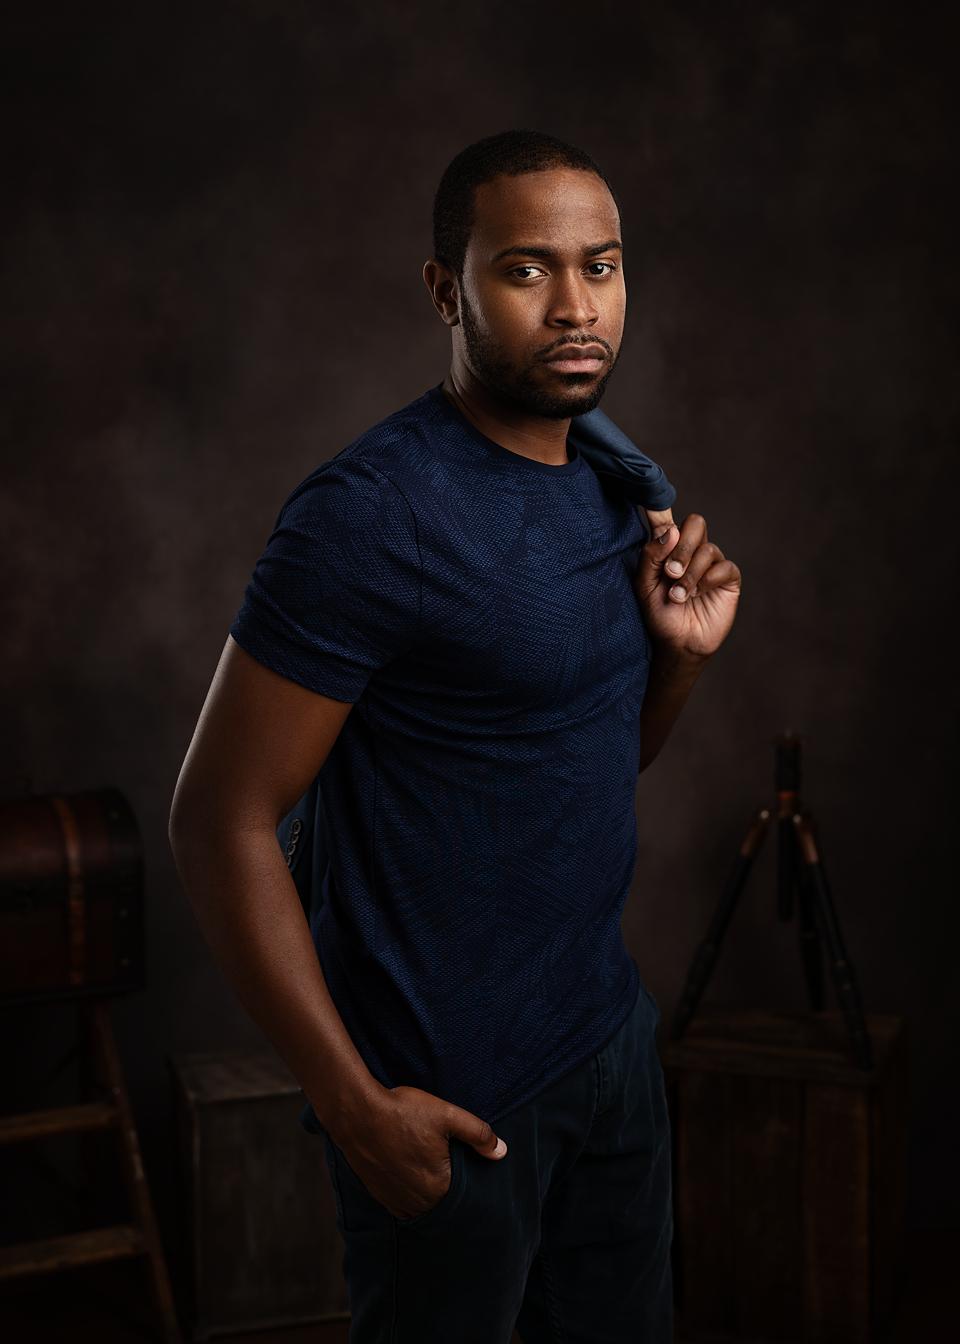 Pinehurst headshot photography studio actor headshots Raleigh Fayetteville Pinehurst Aberdeen Southern Pines amazing actor and realtor headshots